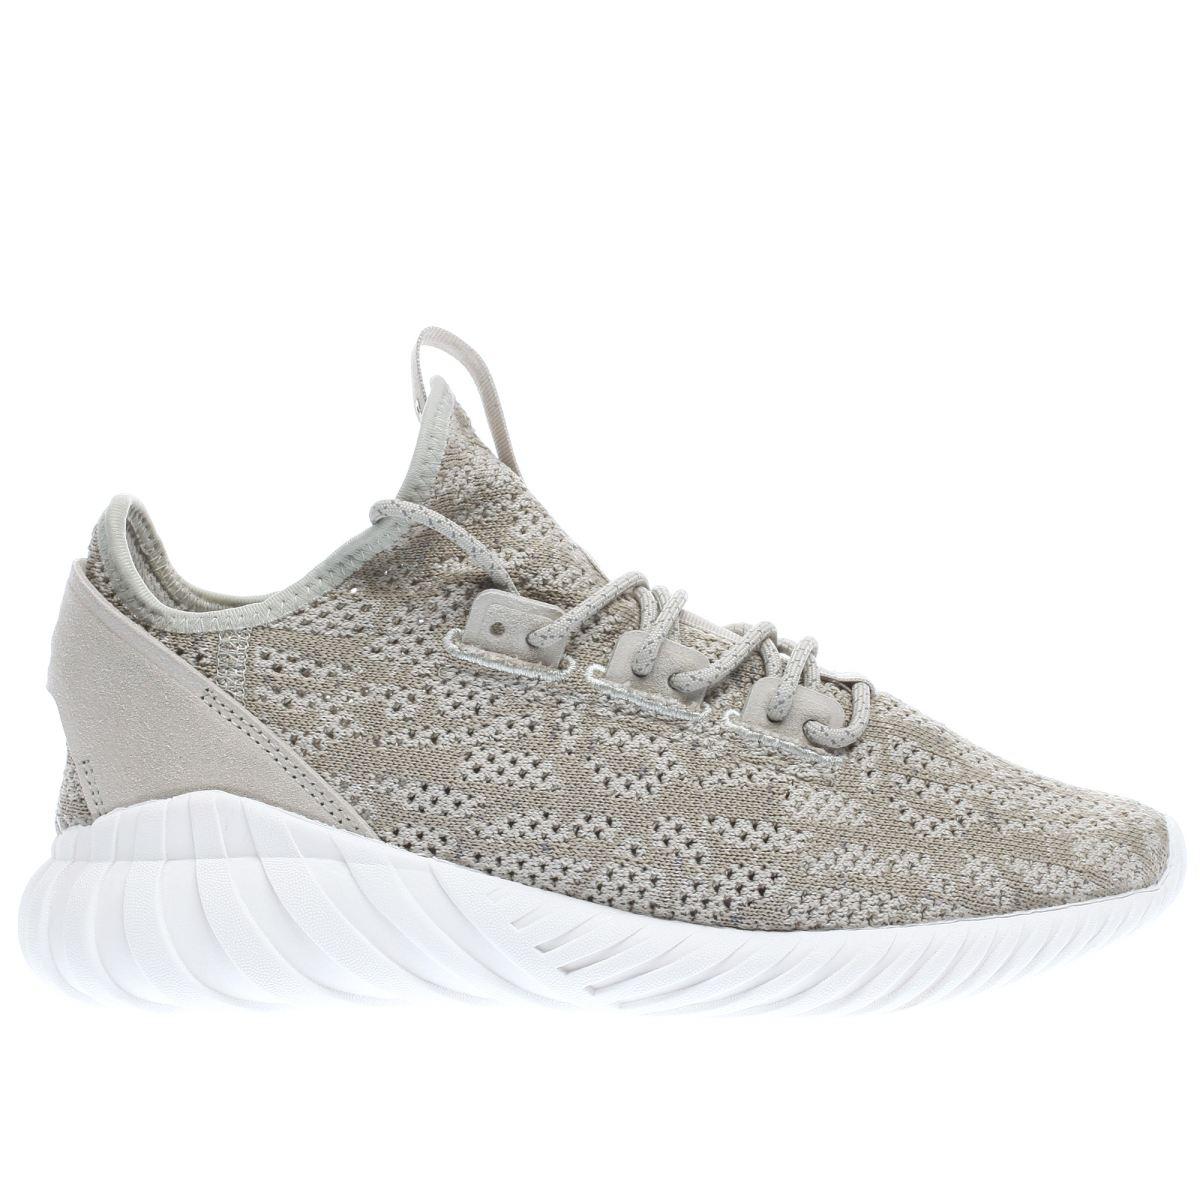 adidas stone tubular doom sock primeknit trainers